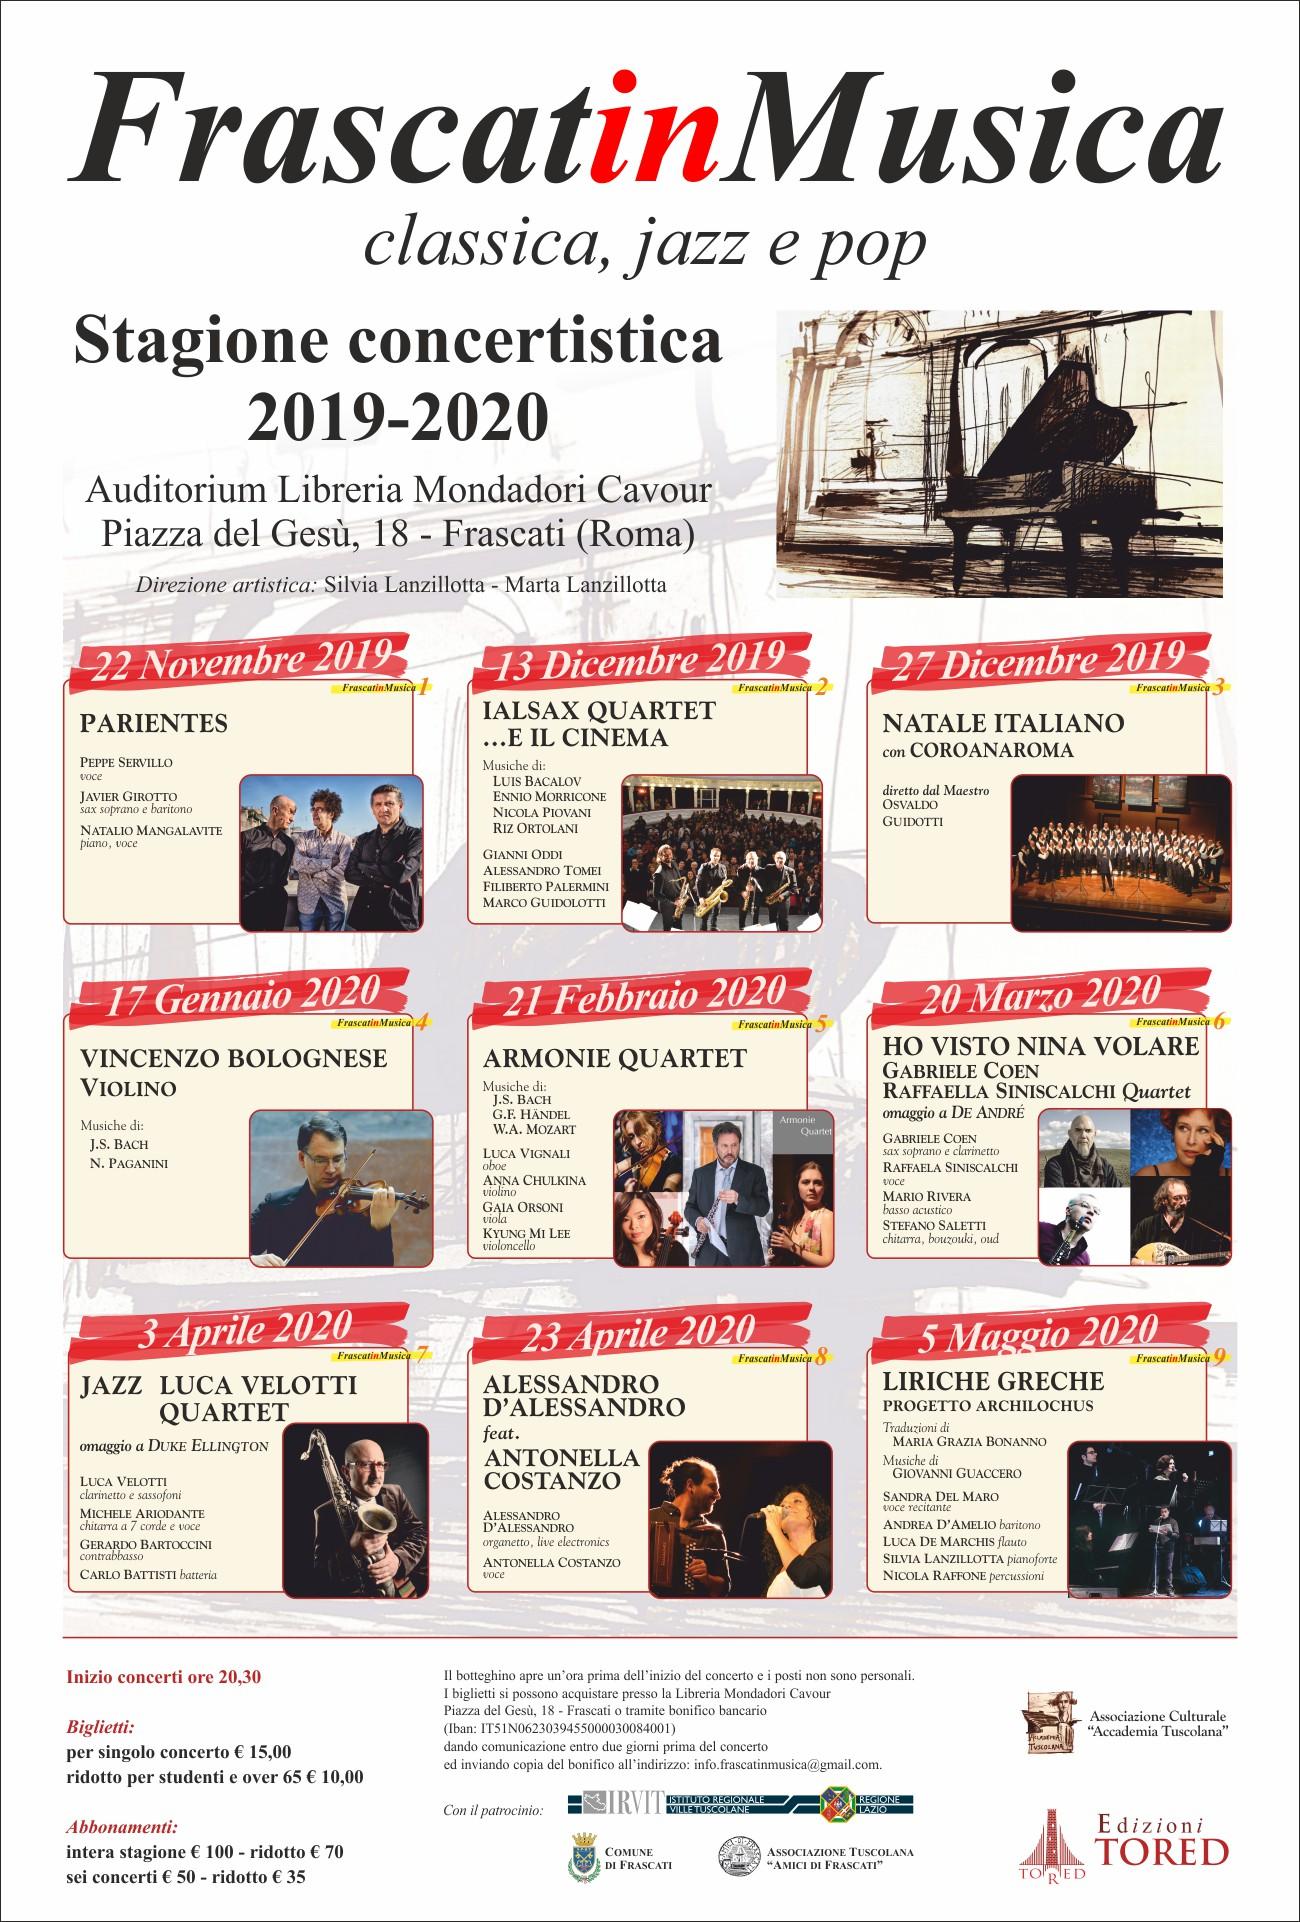 Frascati in Musica - classica, jazz e pop - Stagione concertistica 2019-2020 @ Frascati Auditorium Libreria Mondadori Cavour